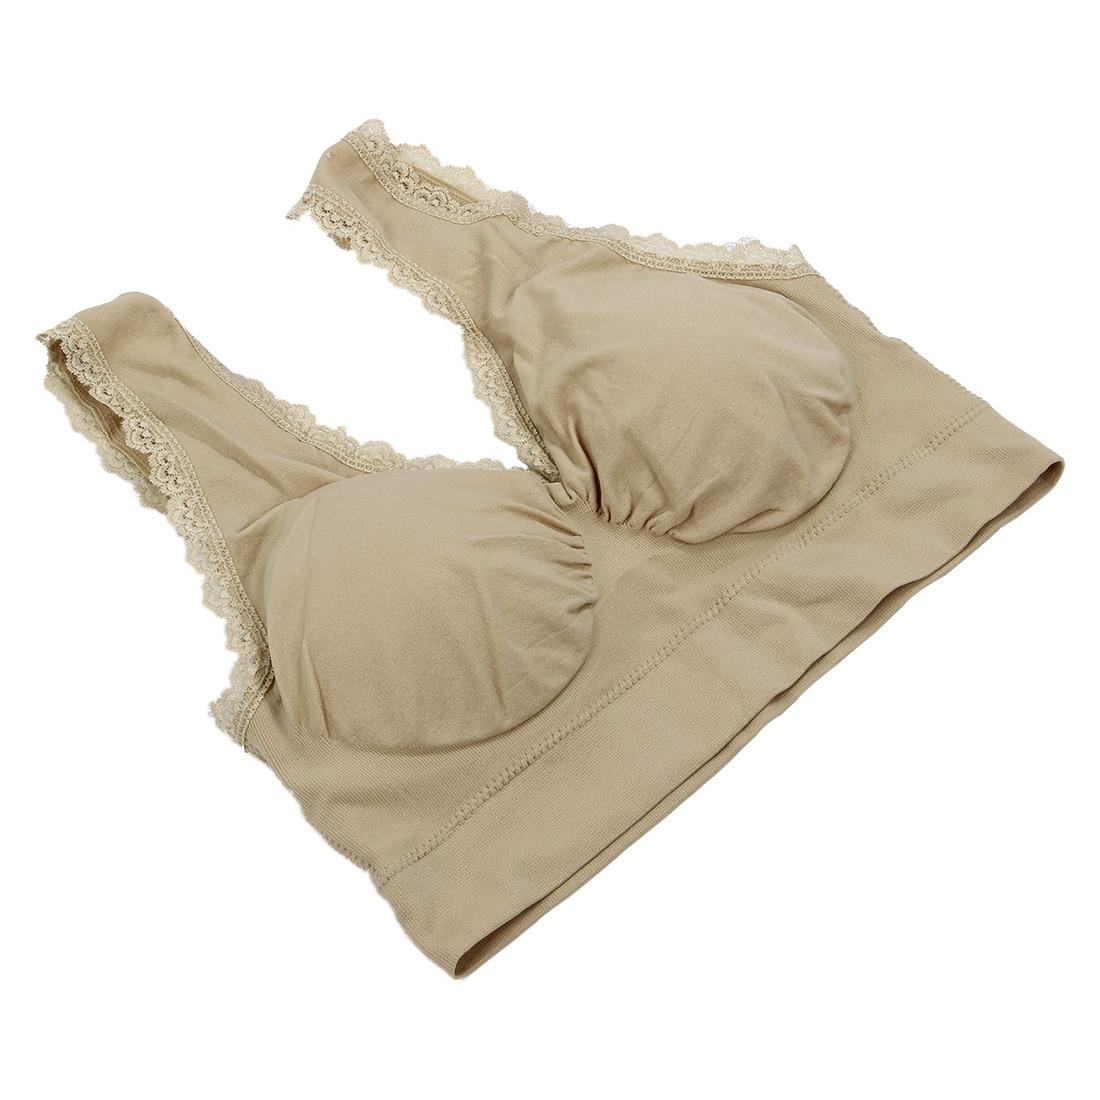 Womens Sports Bra Padded Lace Bra Brassiere Gym Yoga Athletic Vest (XL, skin color)